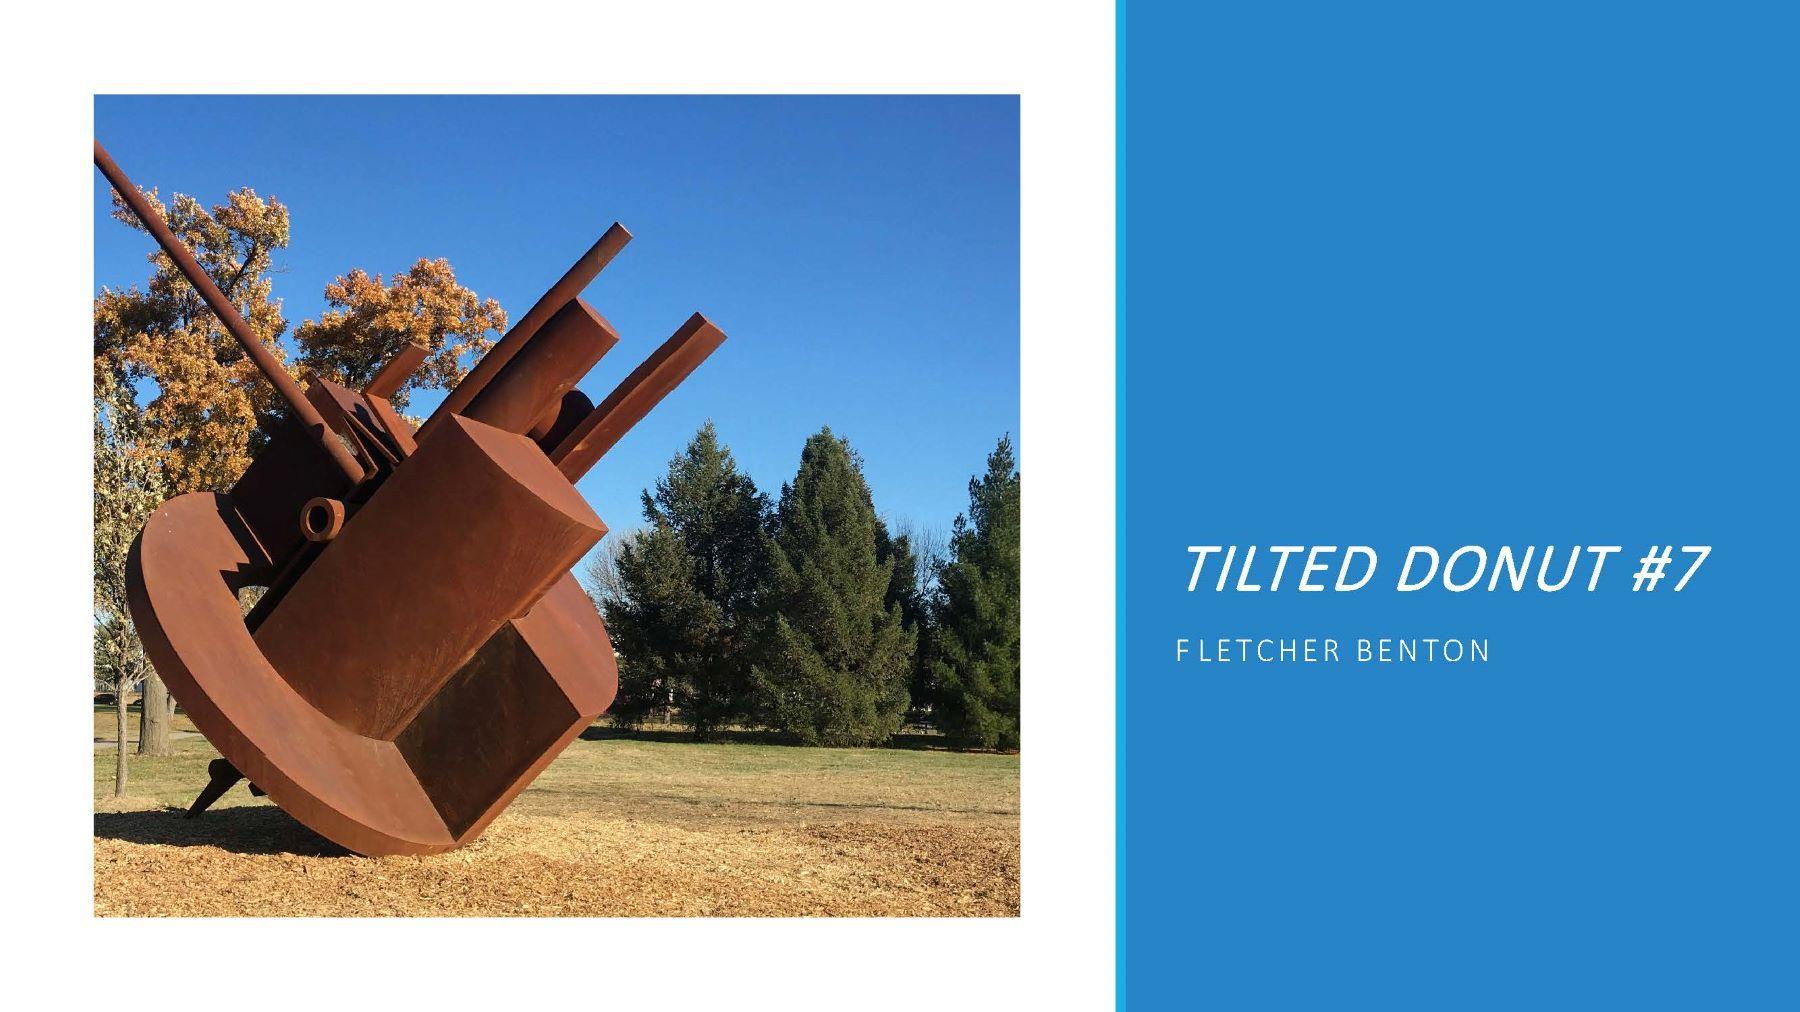 Tilted Donut #7 / Fletcher Benton